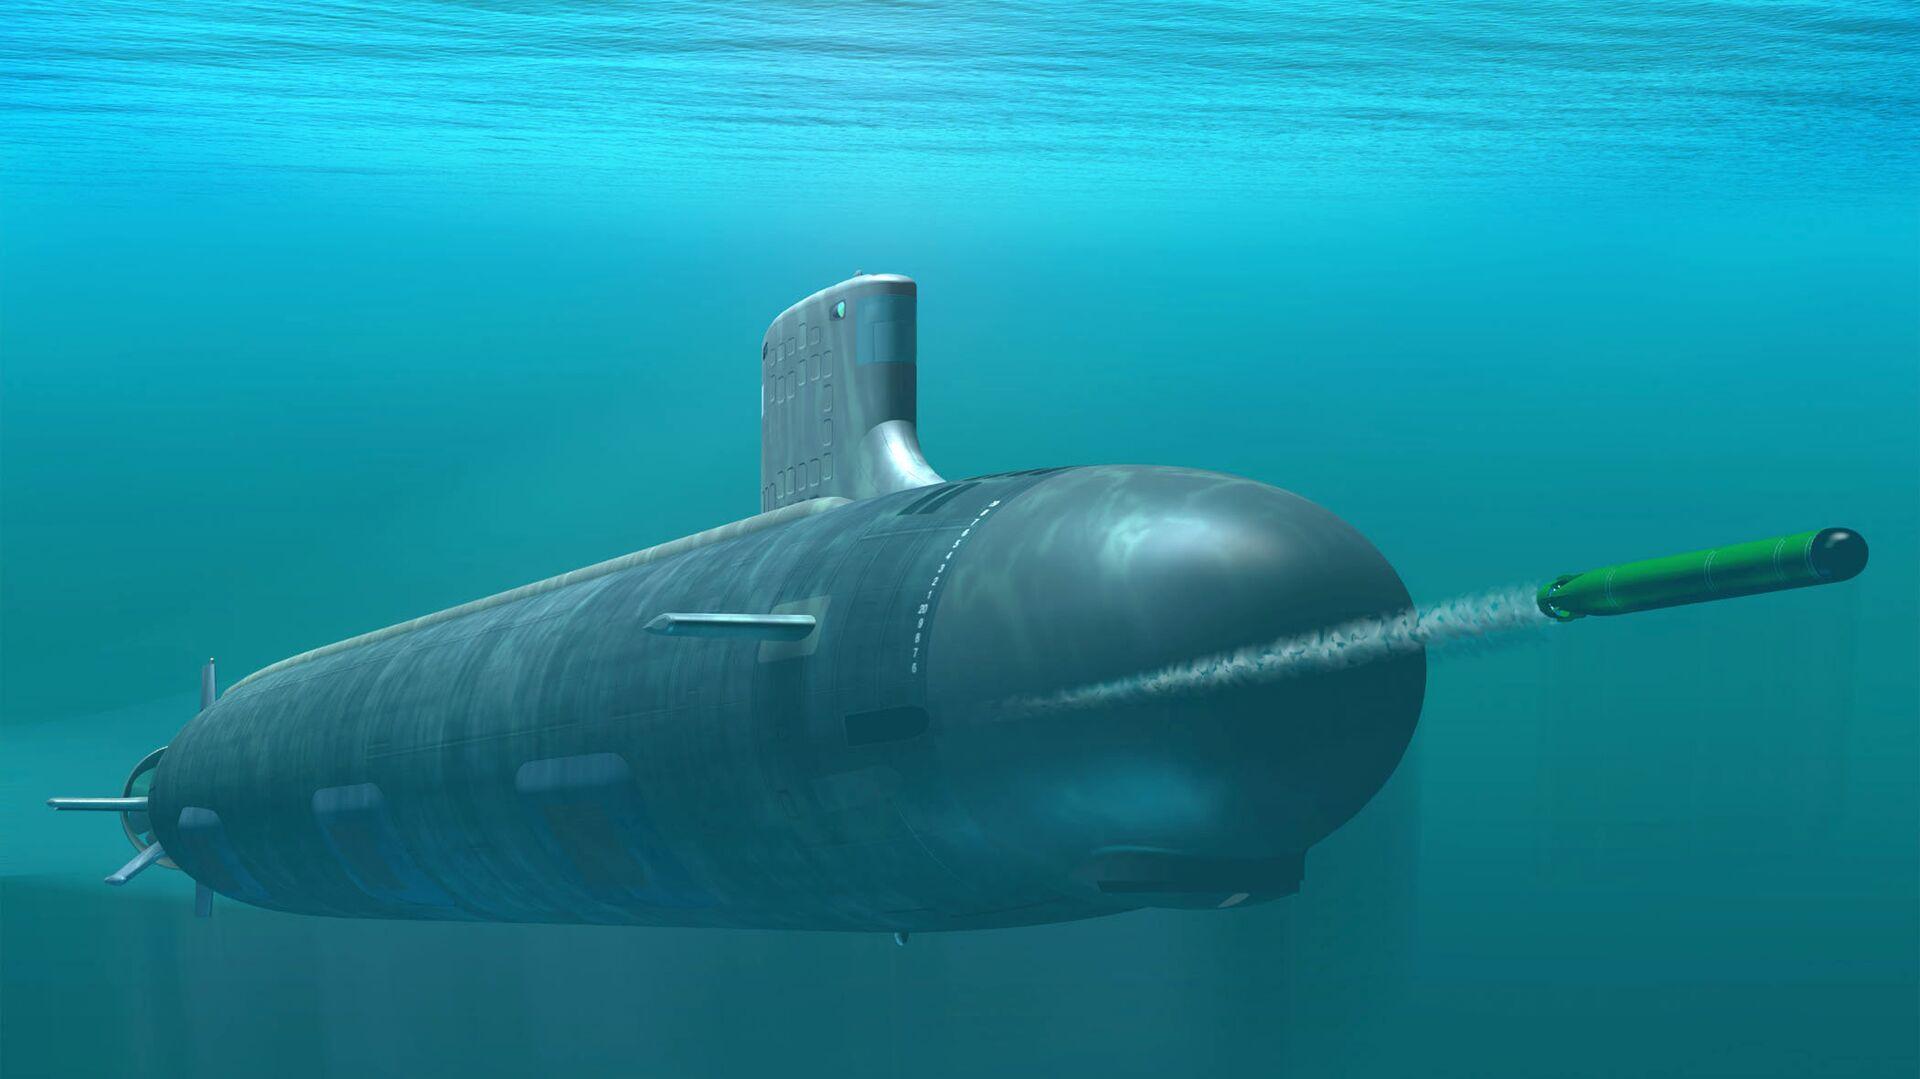 Computer-based rendering of Virginia class attack submarine - Sputnik International, 1920, 13.10.2021